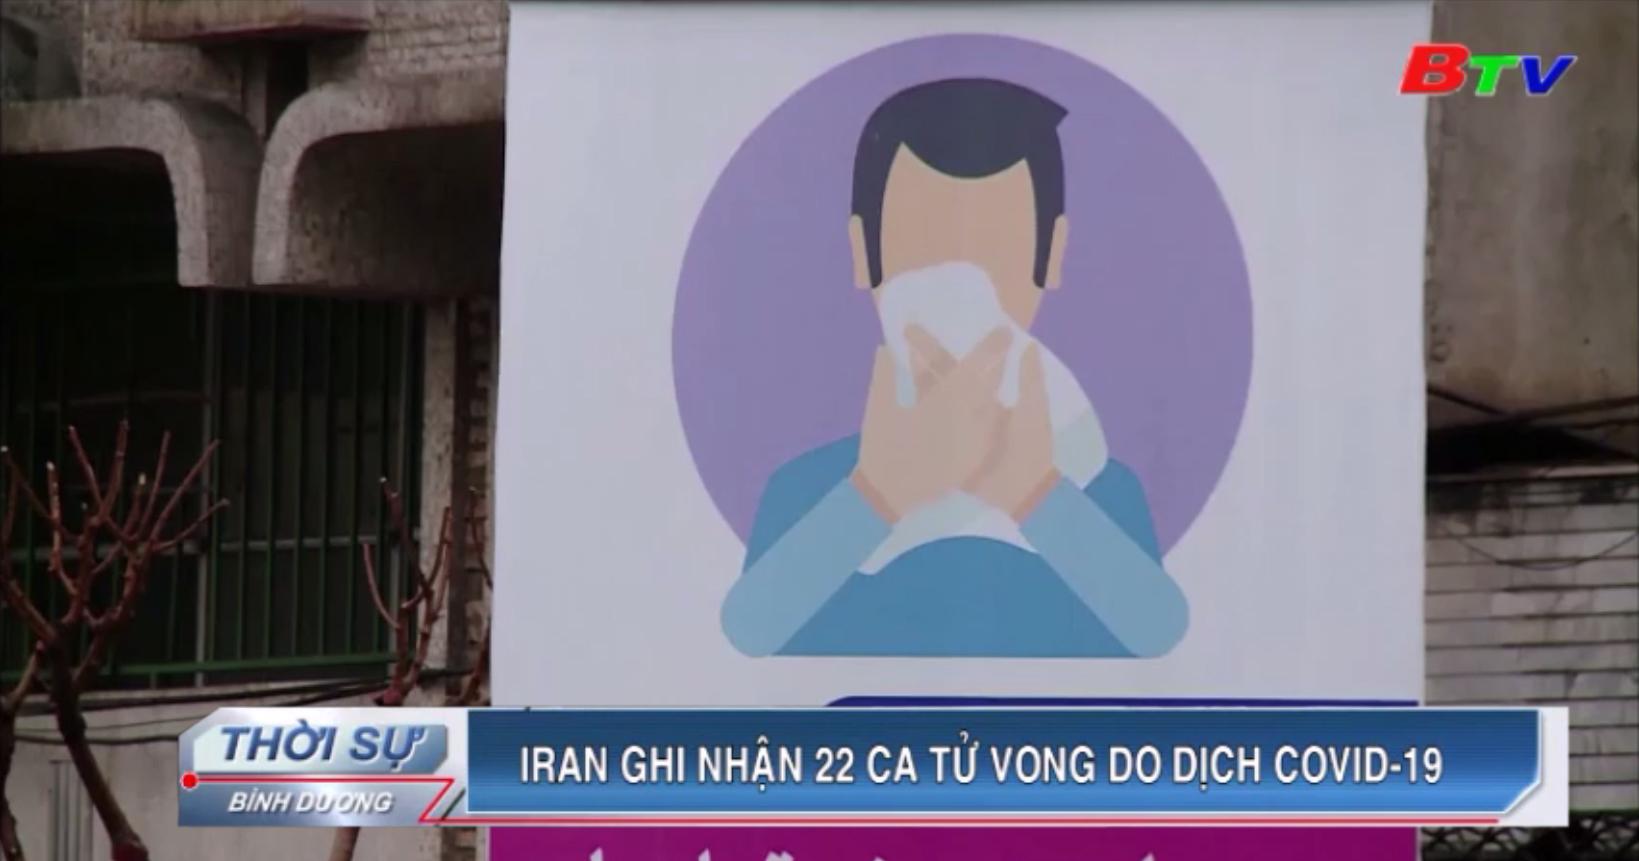 Iran ghi nhận 22 ca tử vong do dịch Covid-19